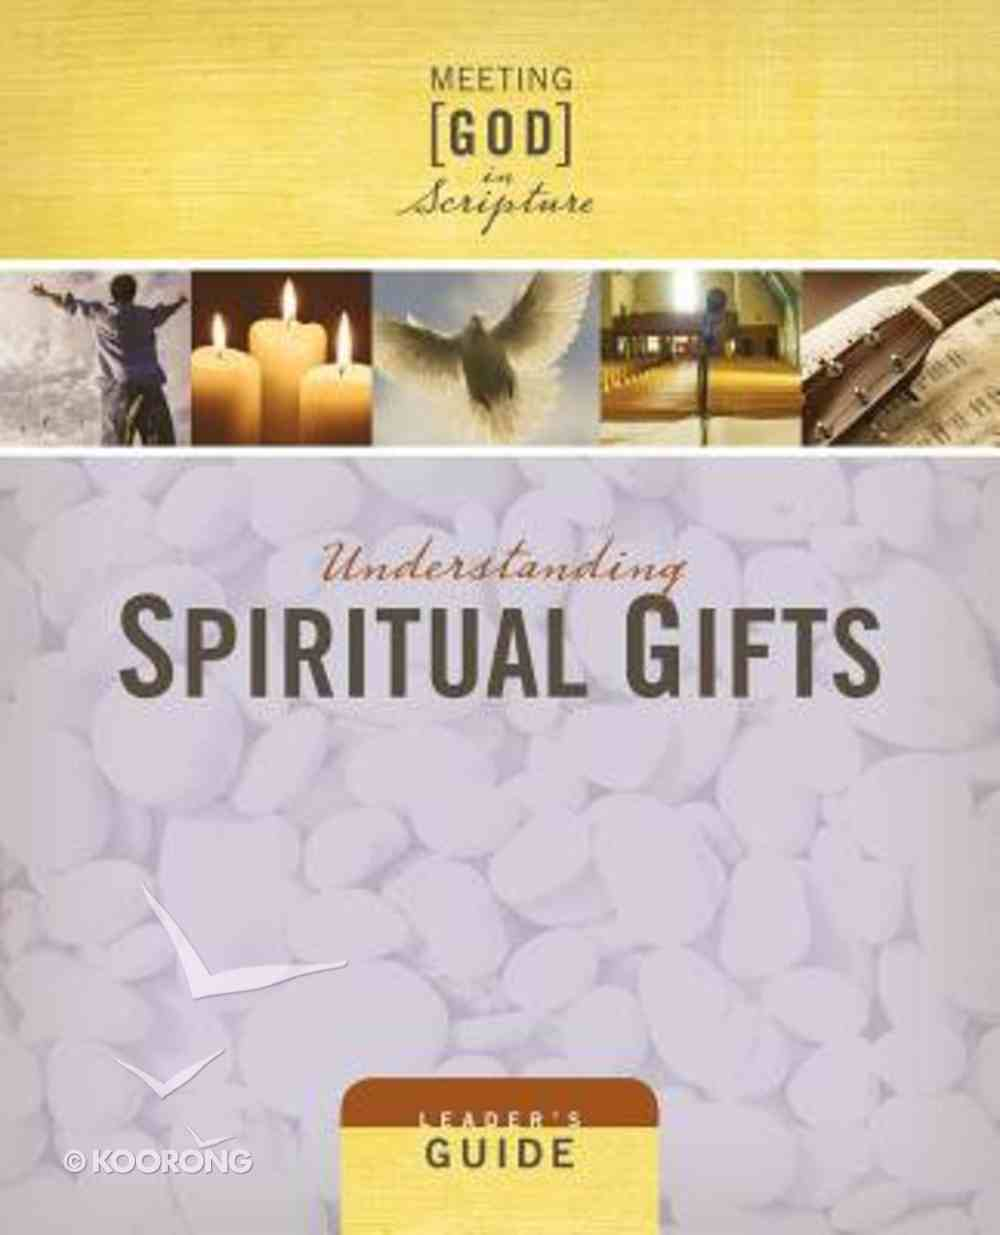 Understanding Spiritual Gifts (Leaders Guide) Paperback